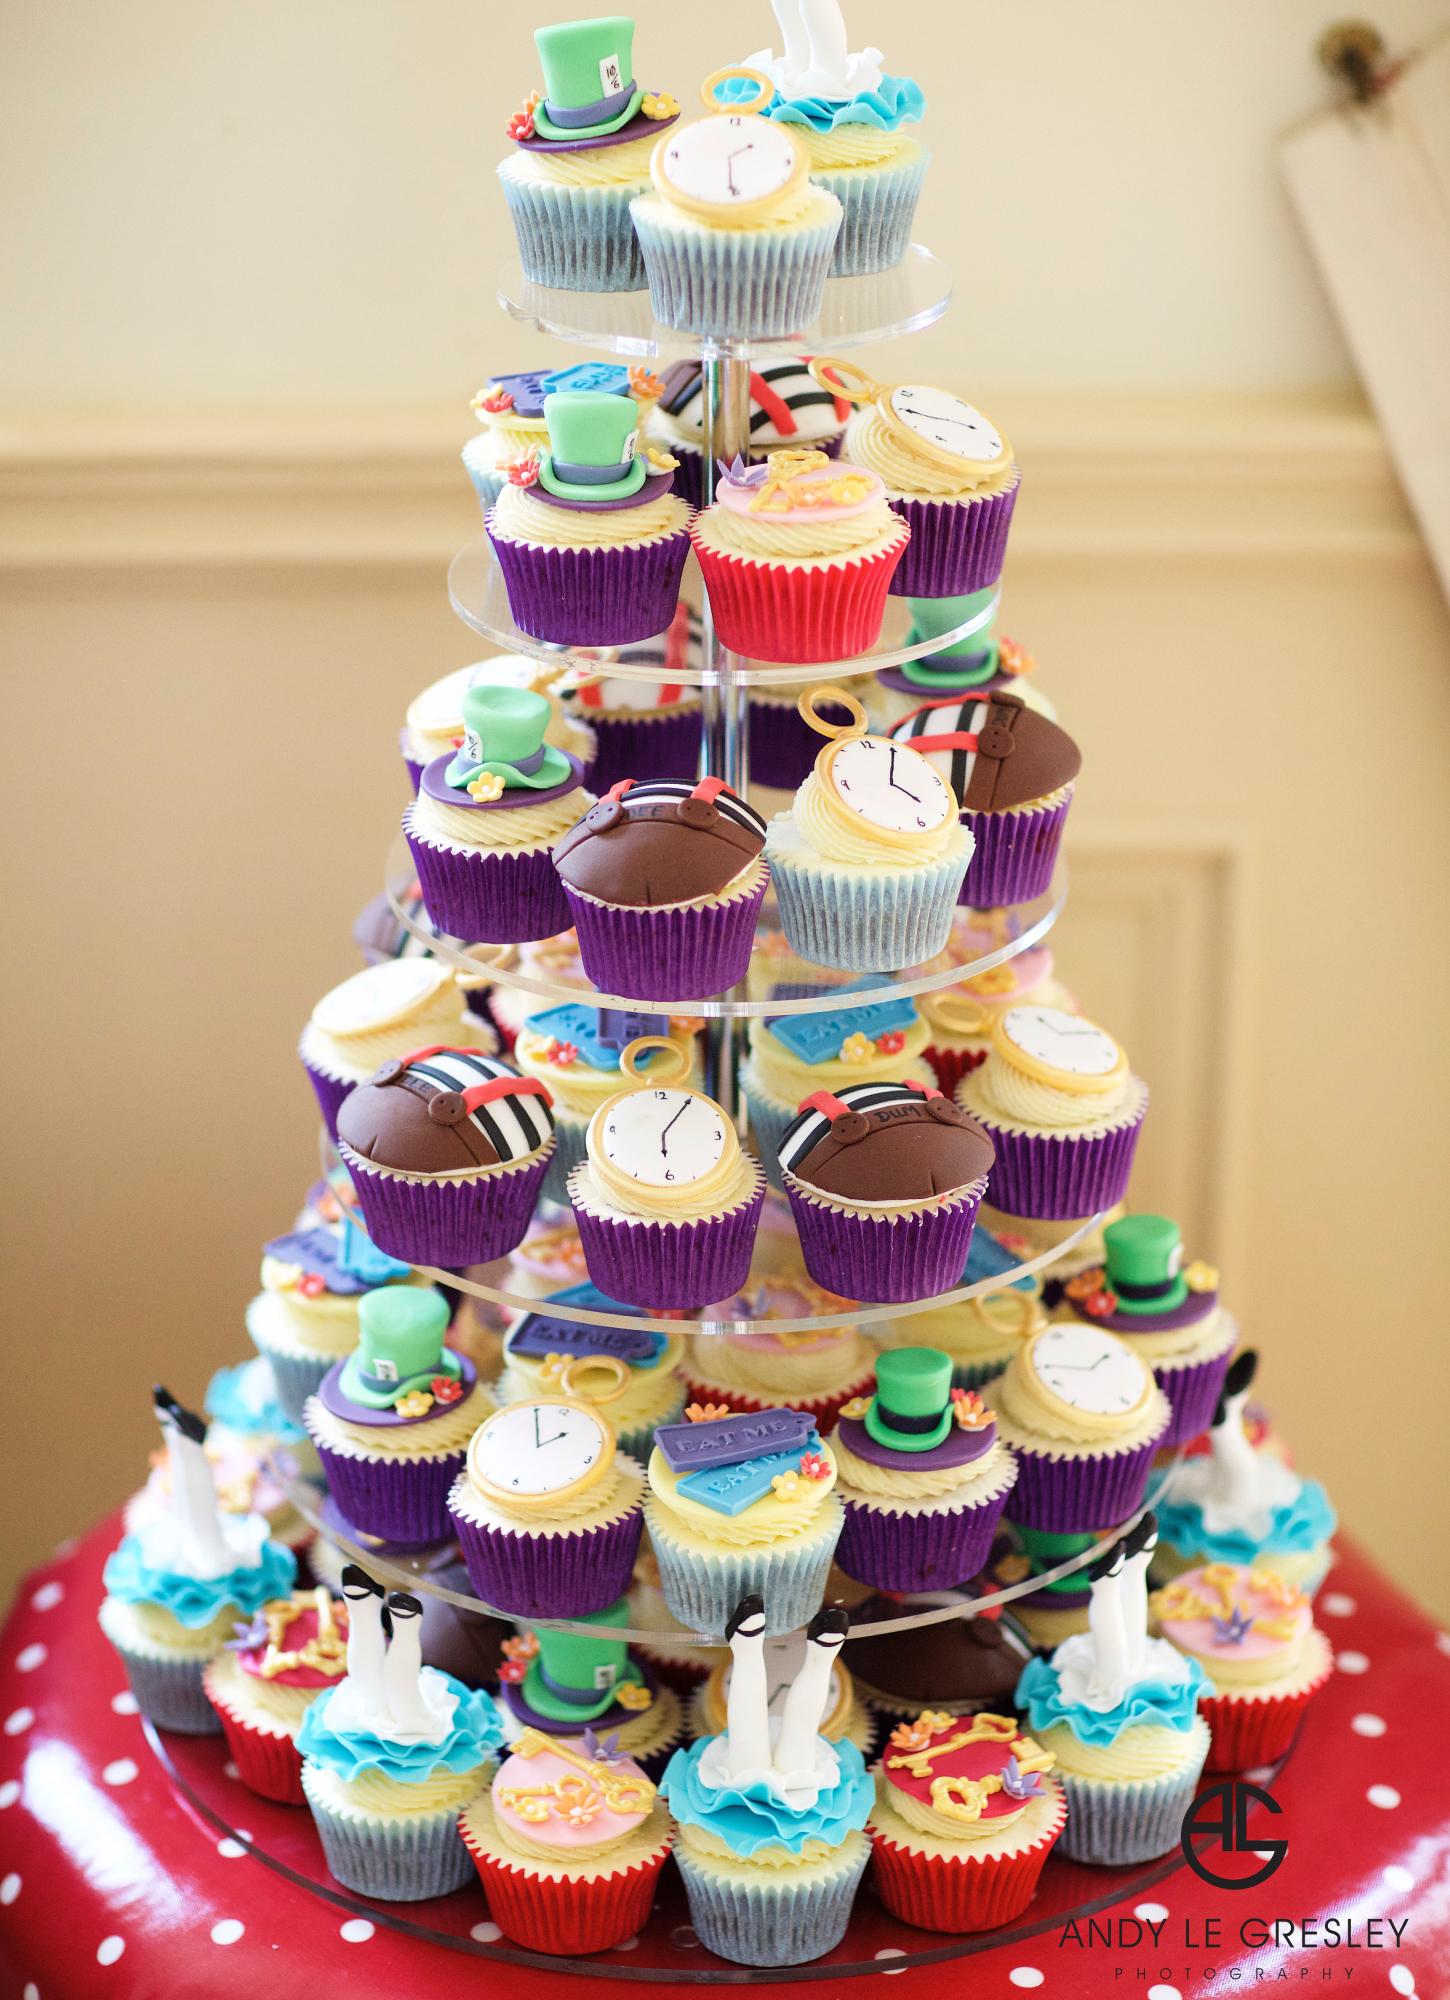 Bespoke Birthday Cupcake Tower - Pat a Cakes Jersey